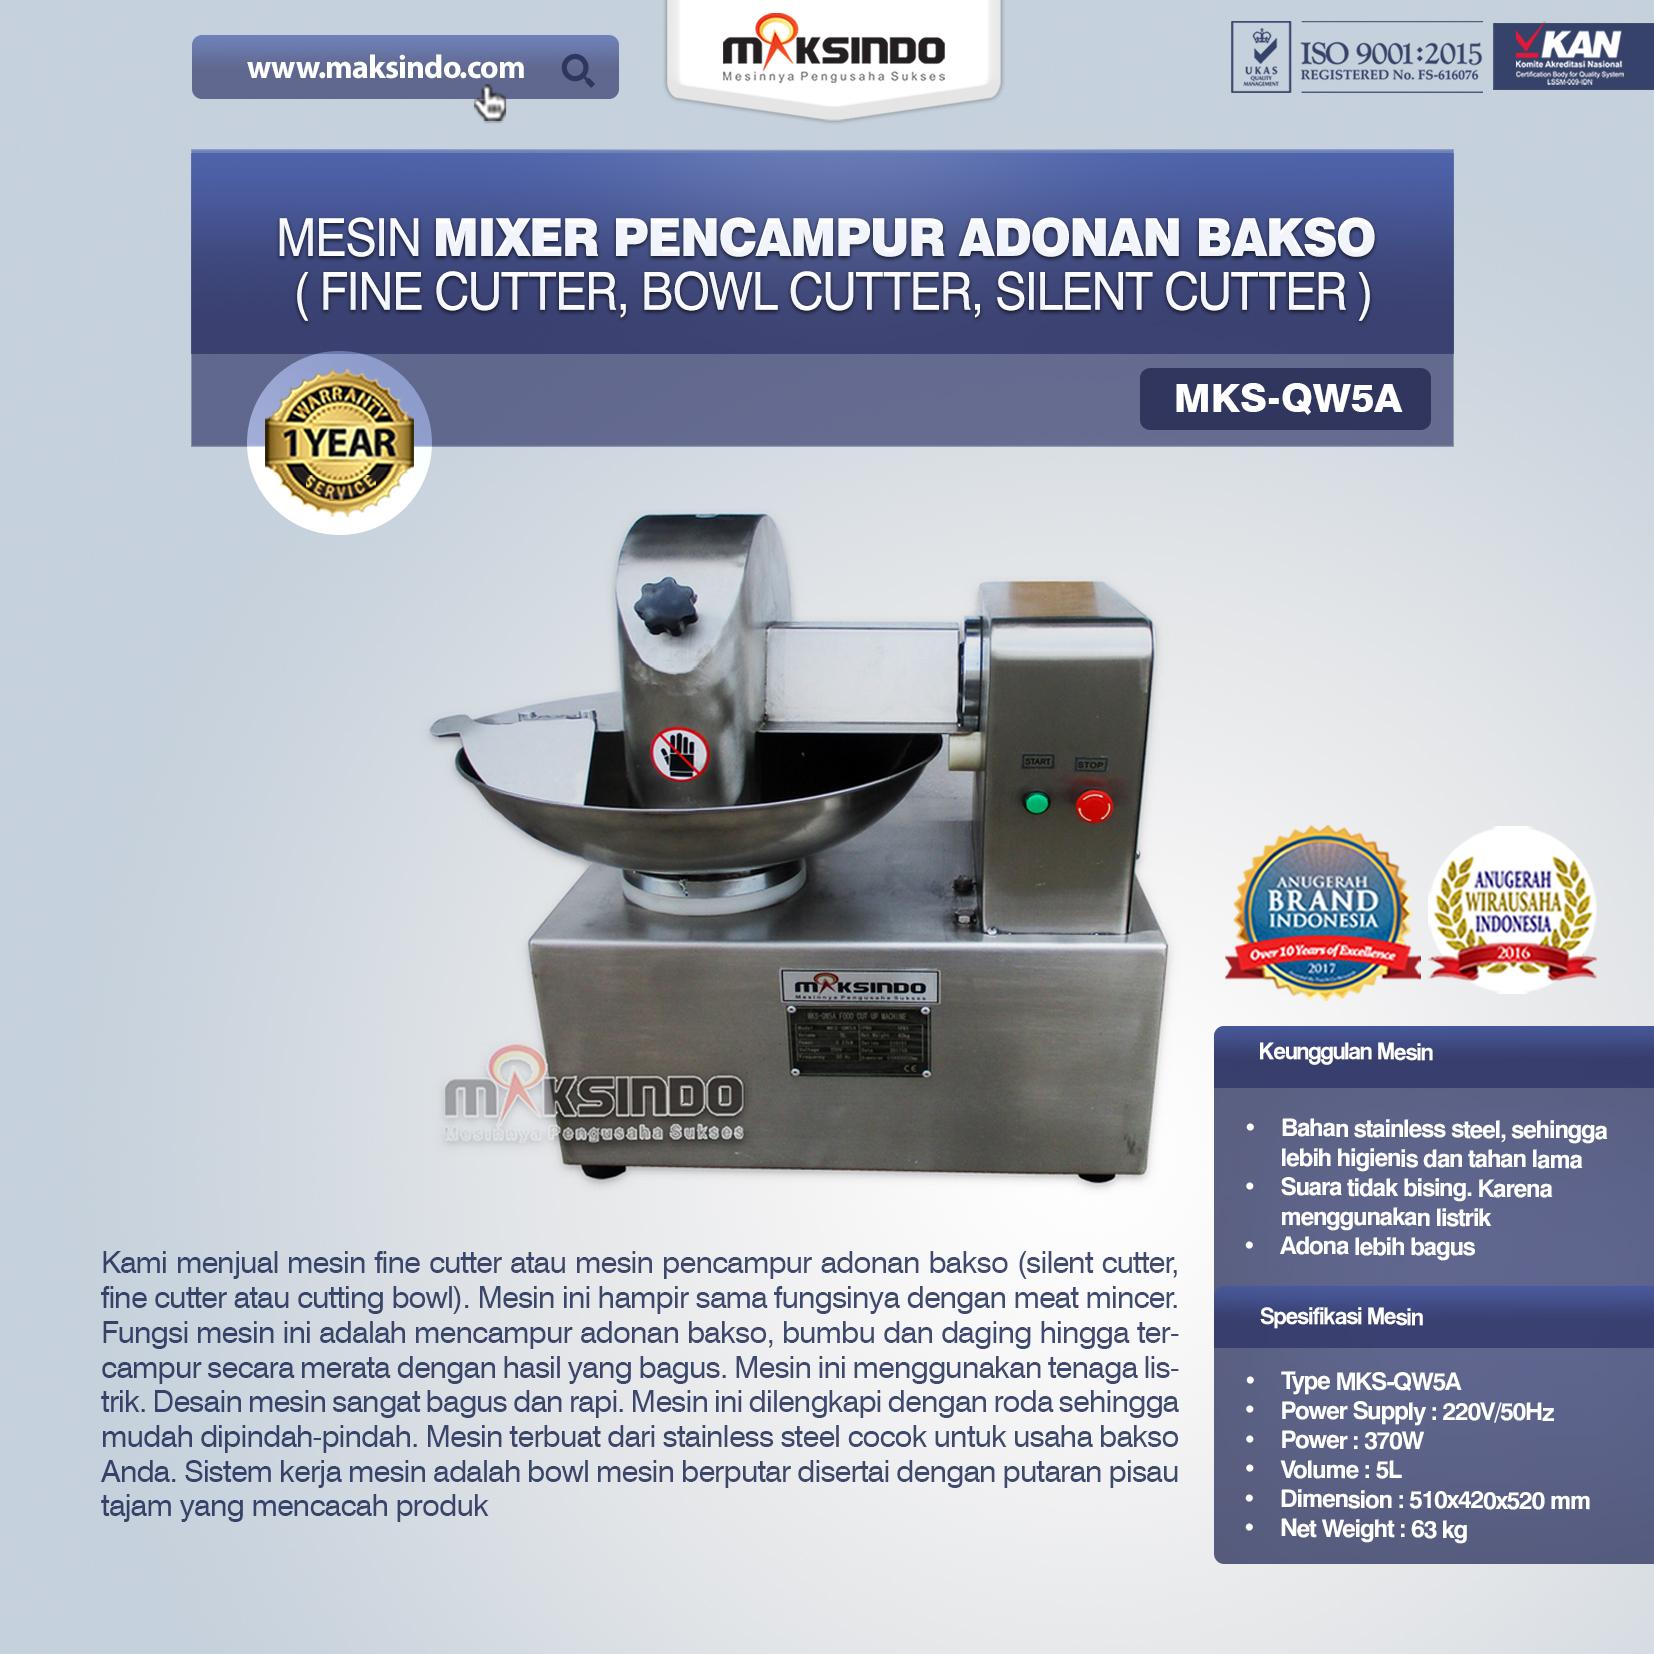 Jual Mesin Adonan Bakso (Cut Bowl / Silent Cutter / Fine Cutter) di Palembang